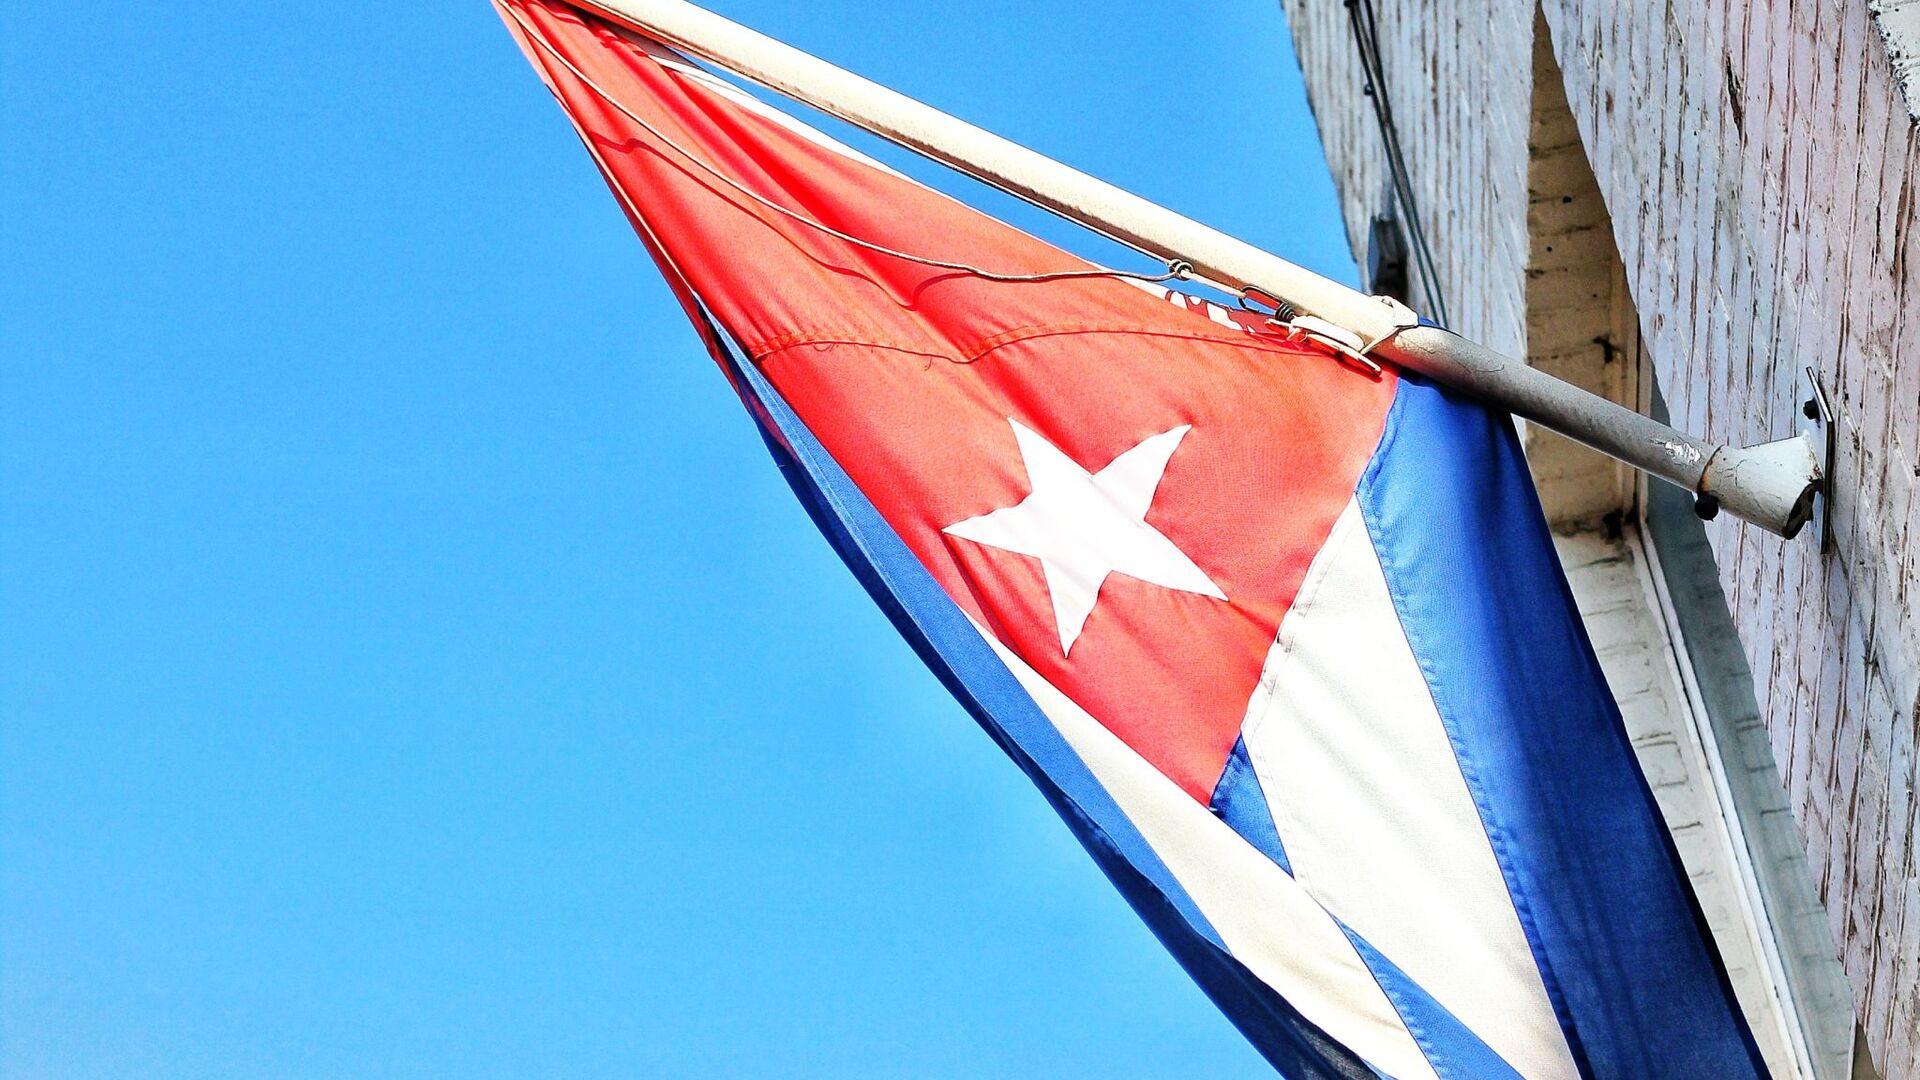 La bandera de Cuba - Sputnik Mundo, 1920, 06.10.2021